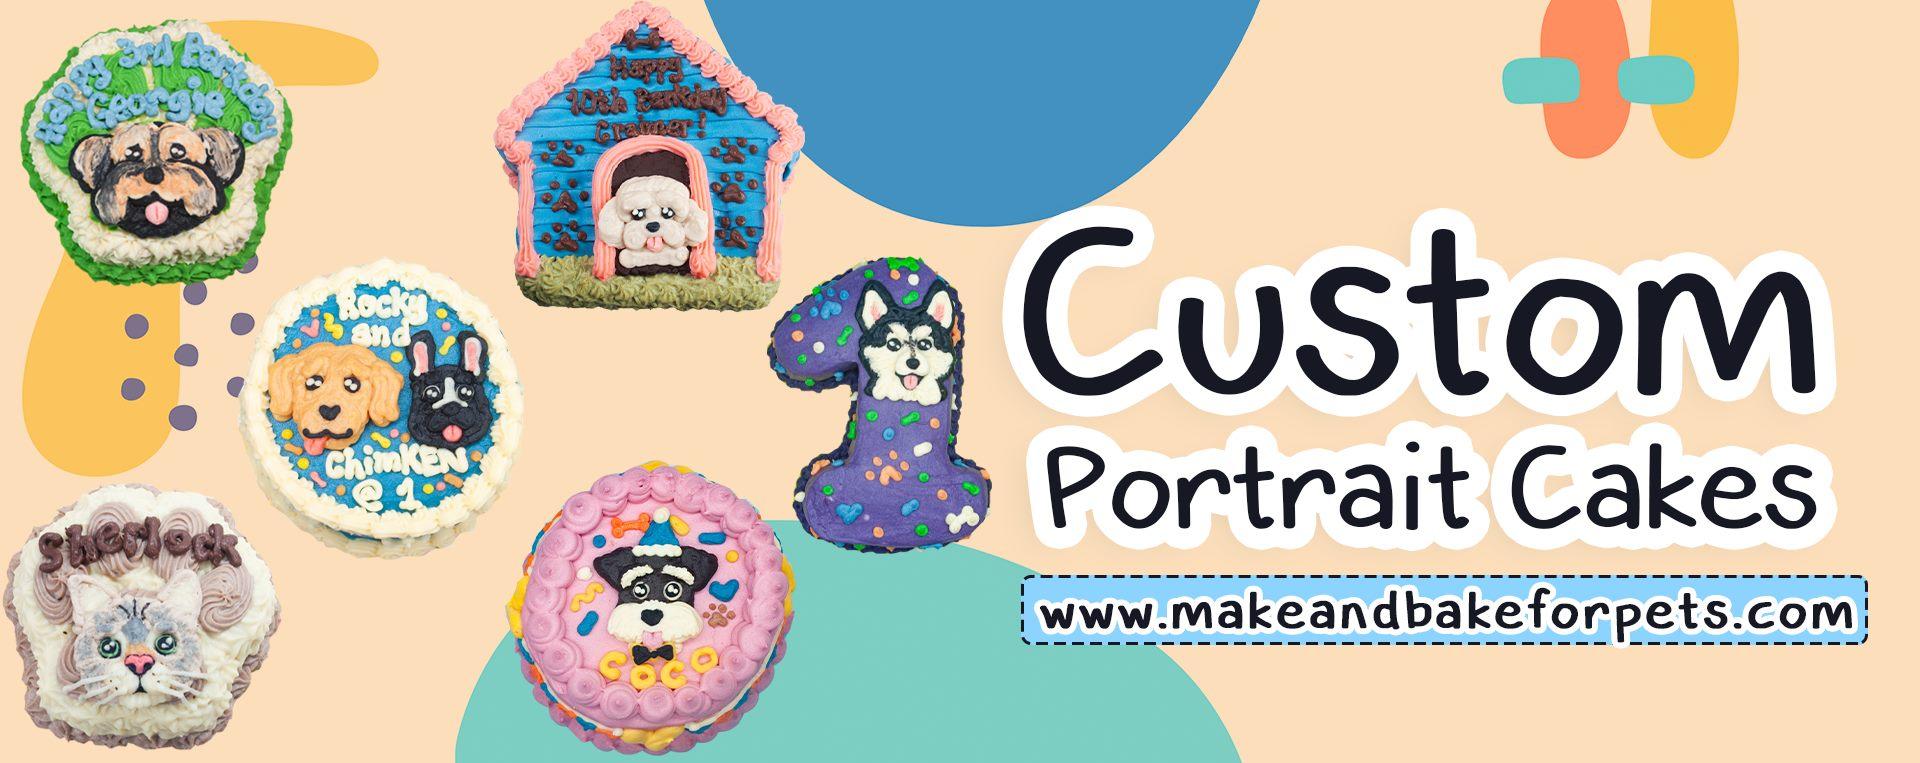 make and bake for pets